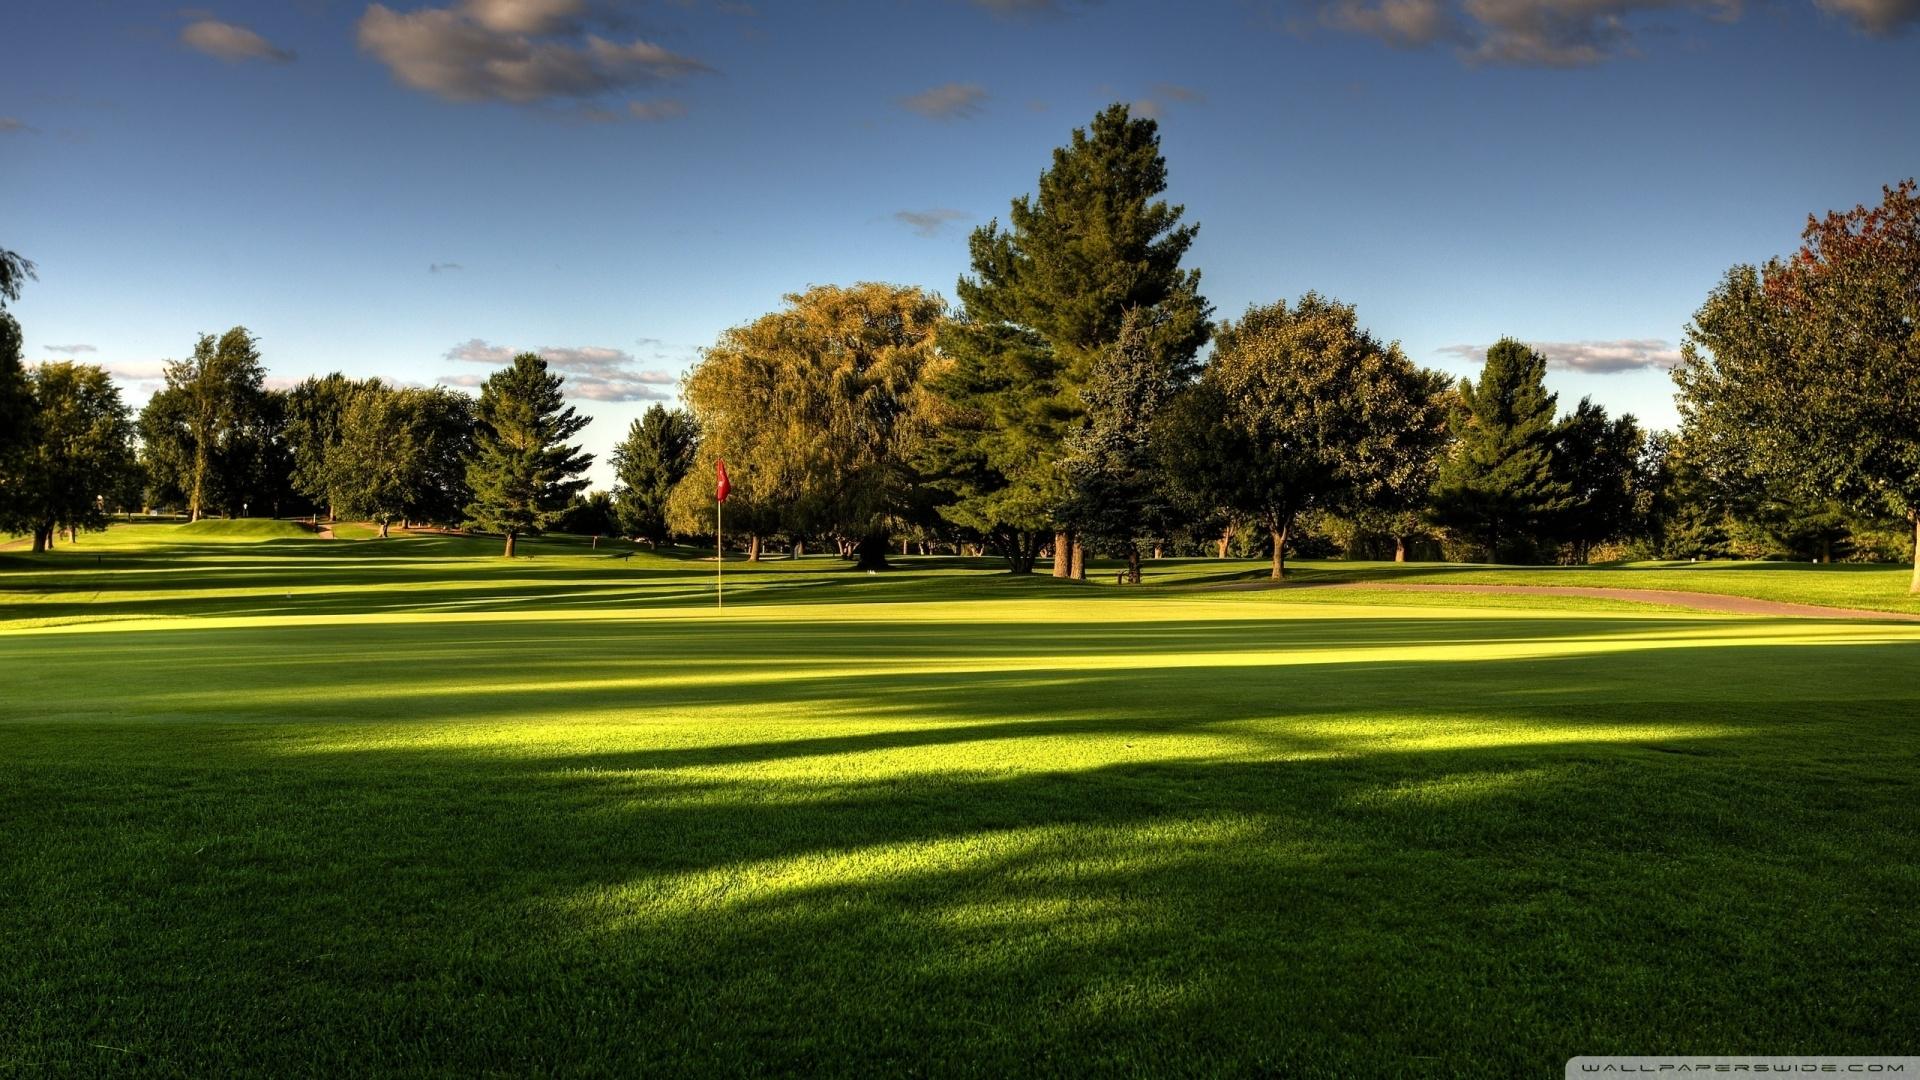 beautiful golf course ❤ 4k hd desktop wallpaper for • wide & ultra